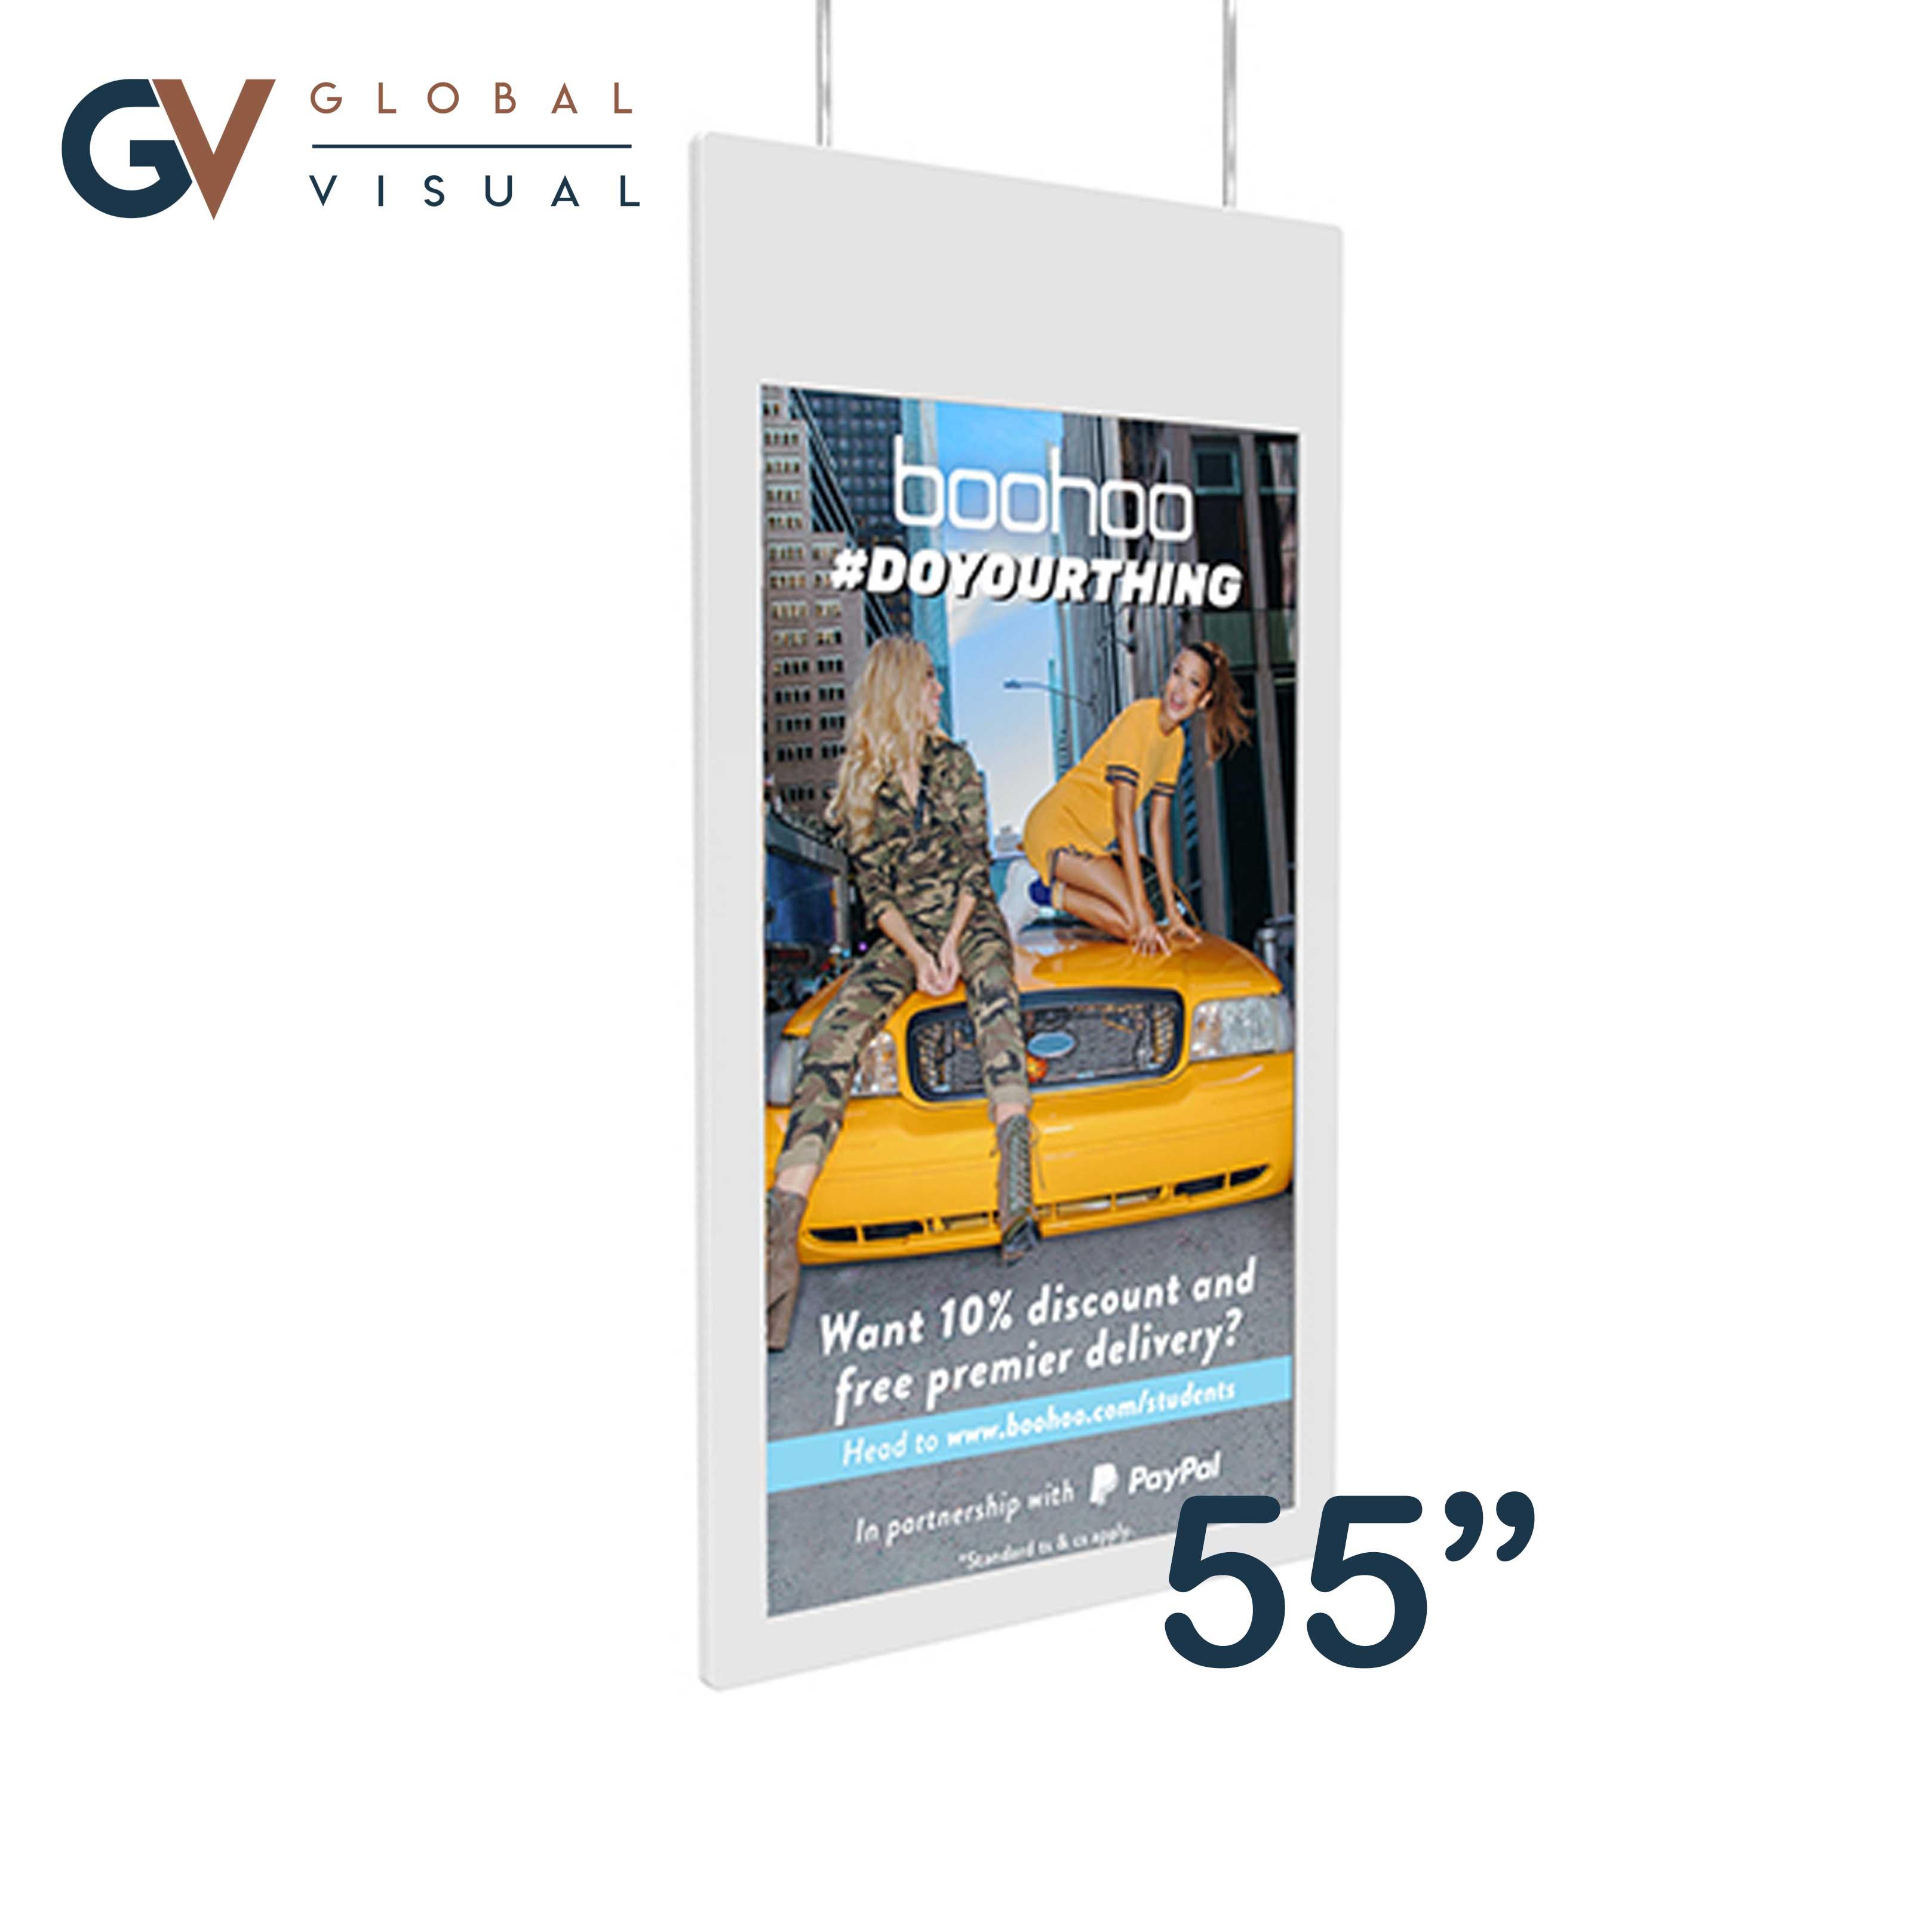 "Image of 55"" Double Sided Window Display"